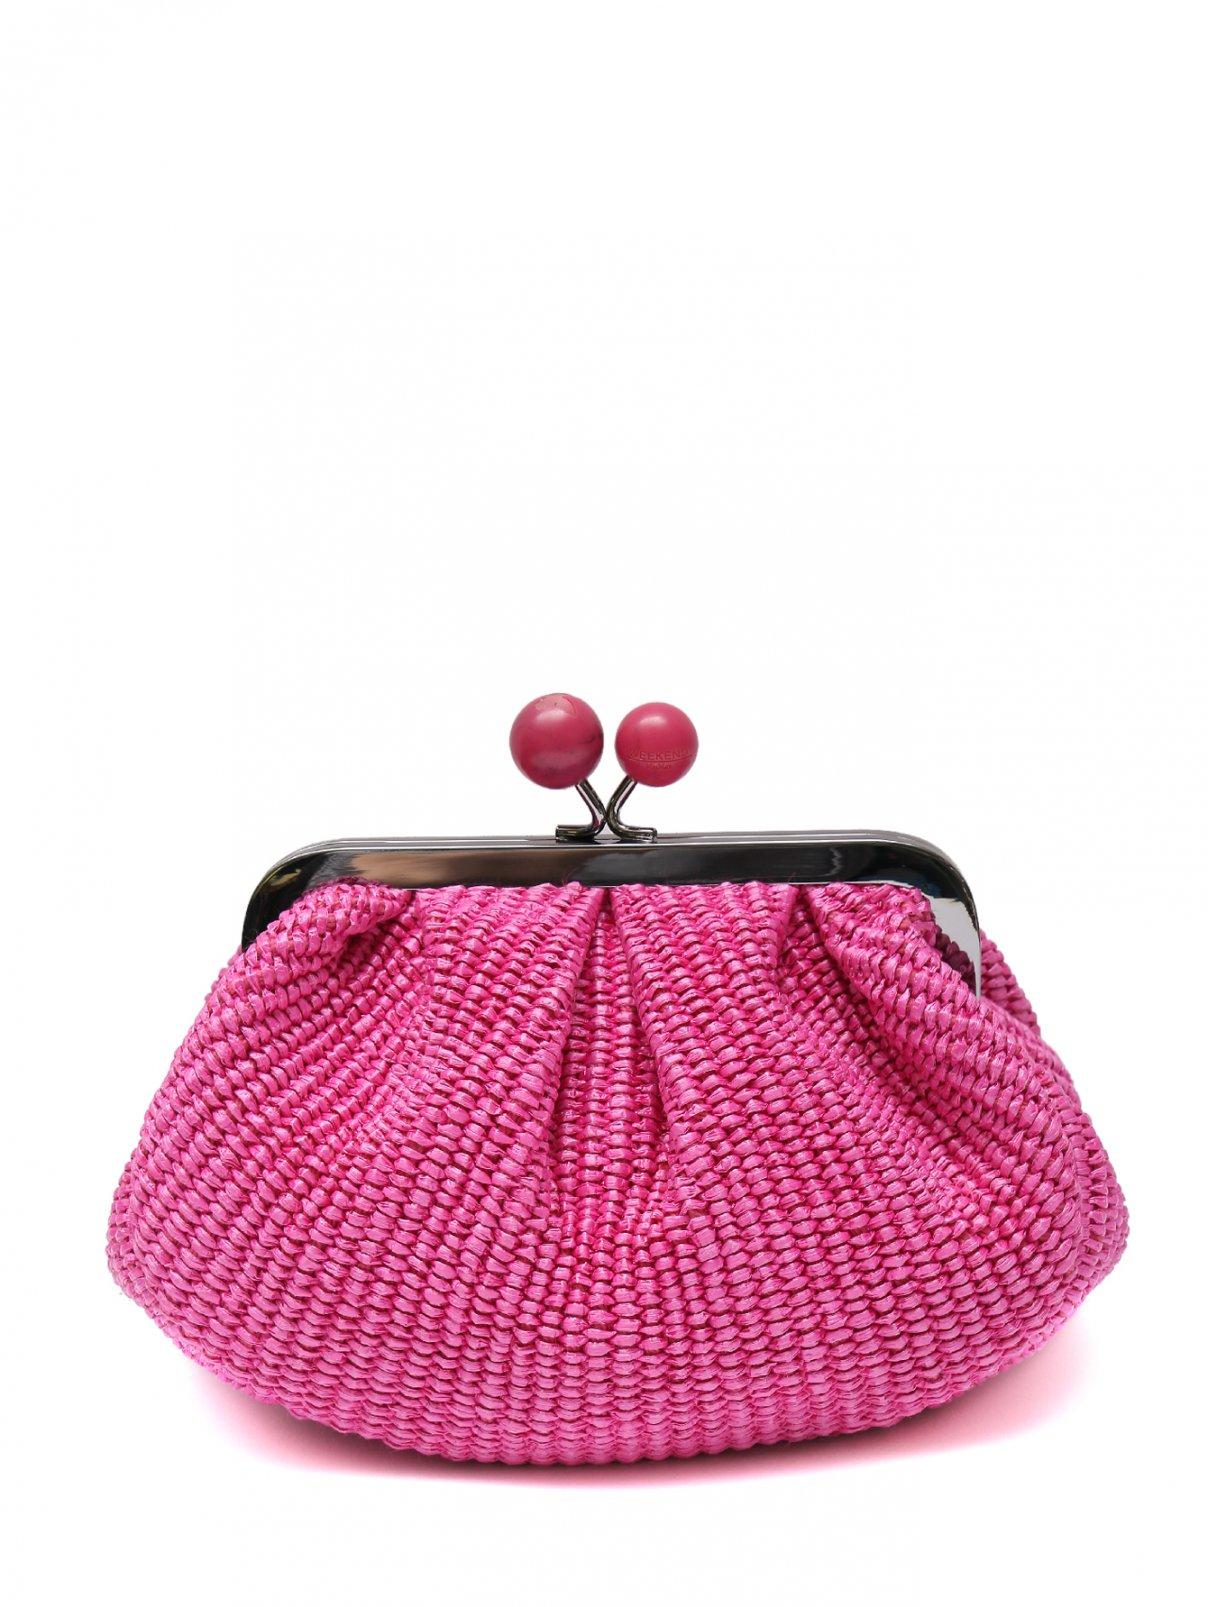 сумка плетеная на цепочке Weekend Max Mara  –  Общий вид